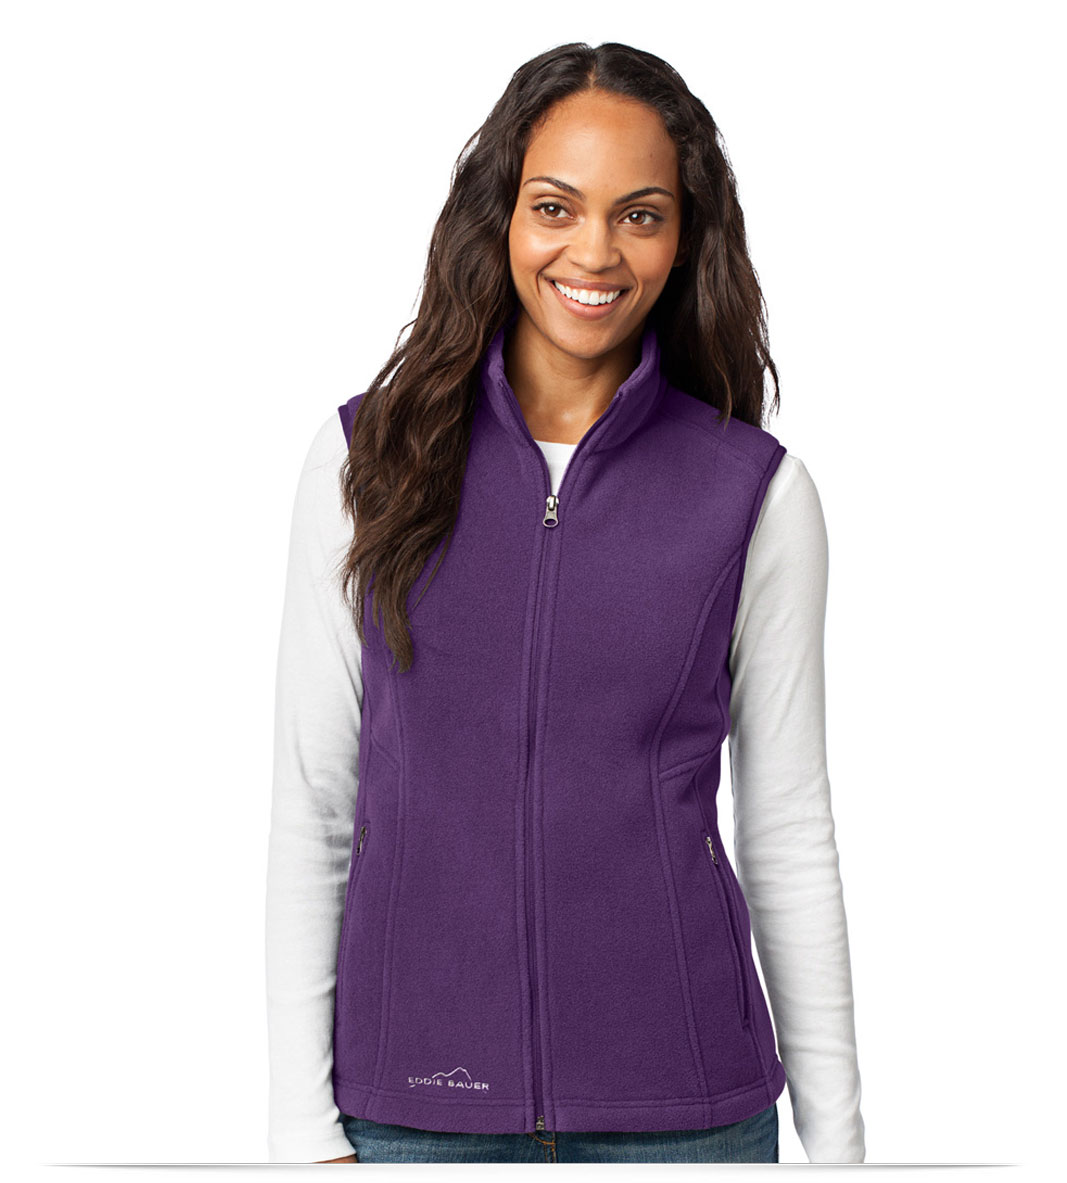 Personalized Eddie Bauer Ladies Fleece Vest